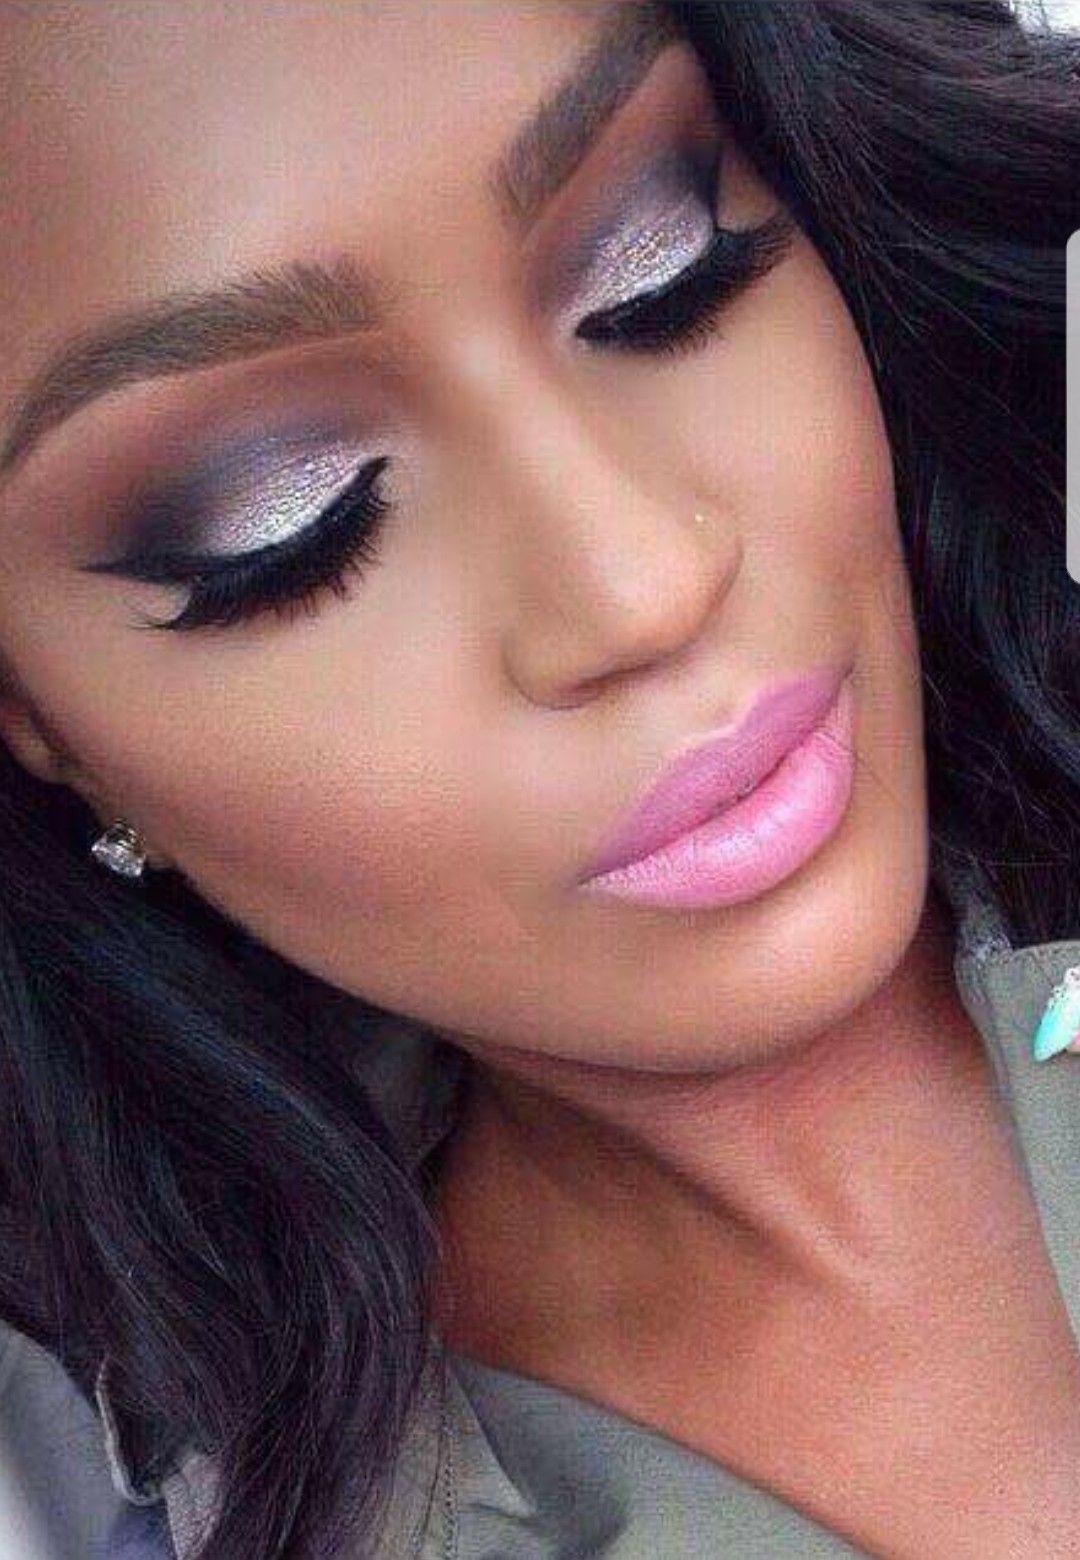 Pin By Lucinda Fernandez On Eyes Pinterest Make Up Make Up